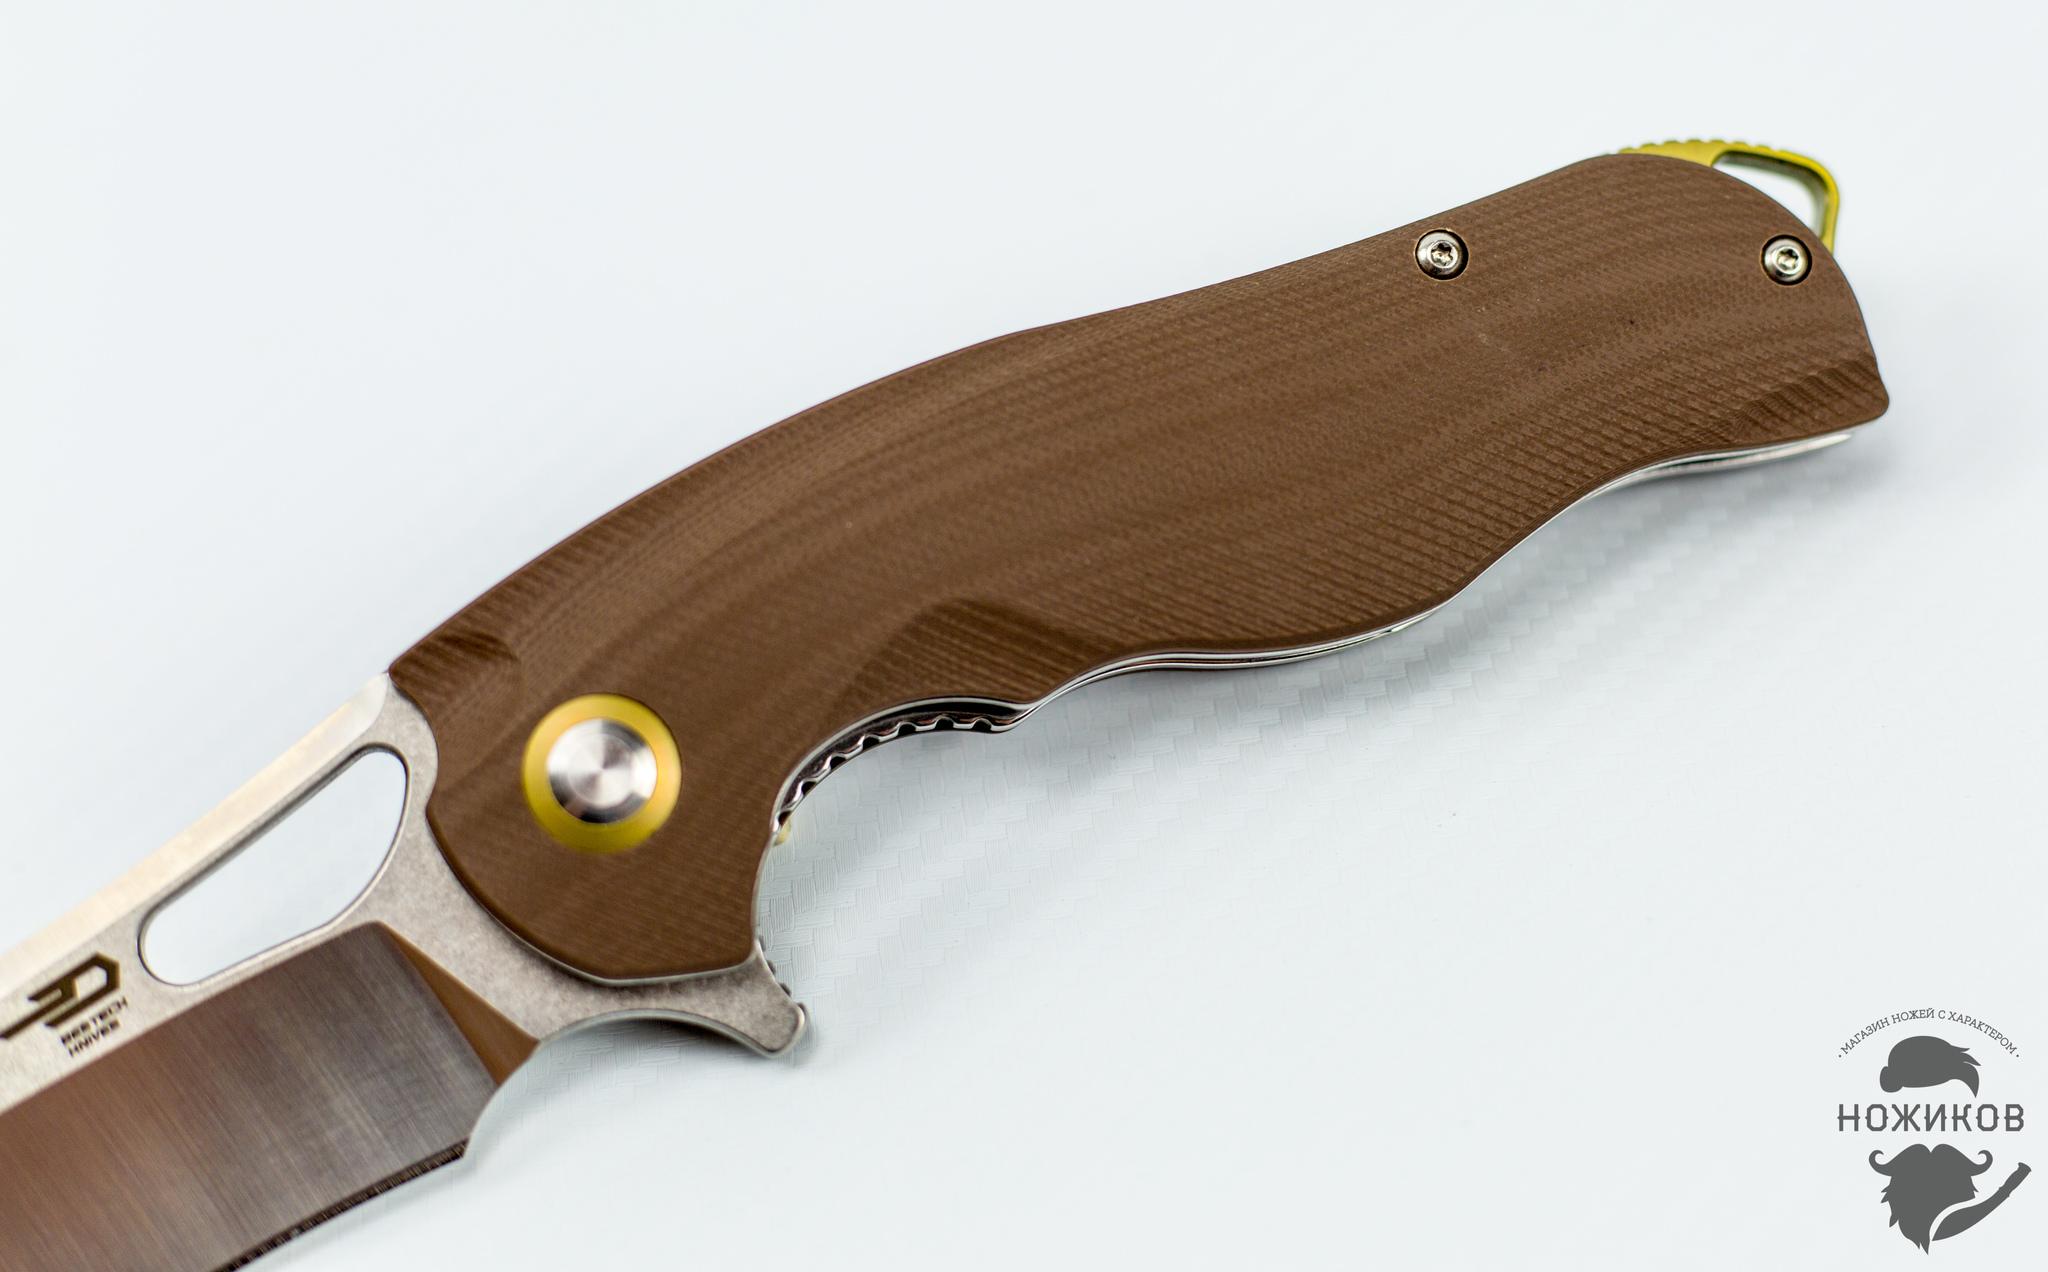 Фото 6 - Складной нож Bestech Rhino BG08B, сталь 154CM от Bestech Knives